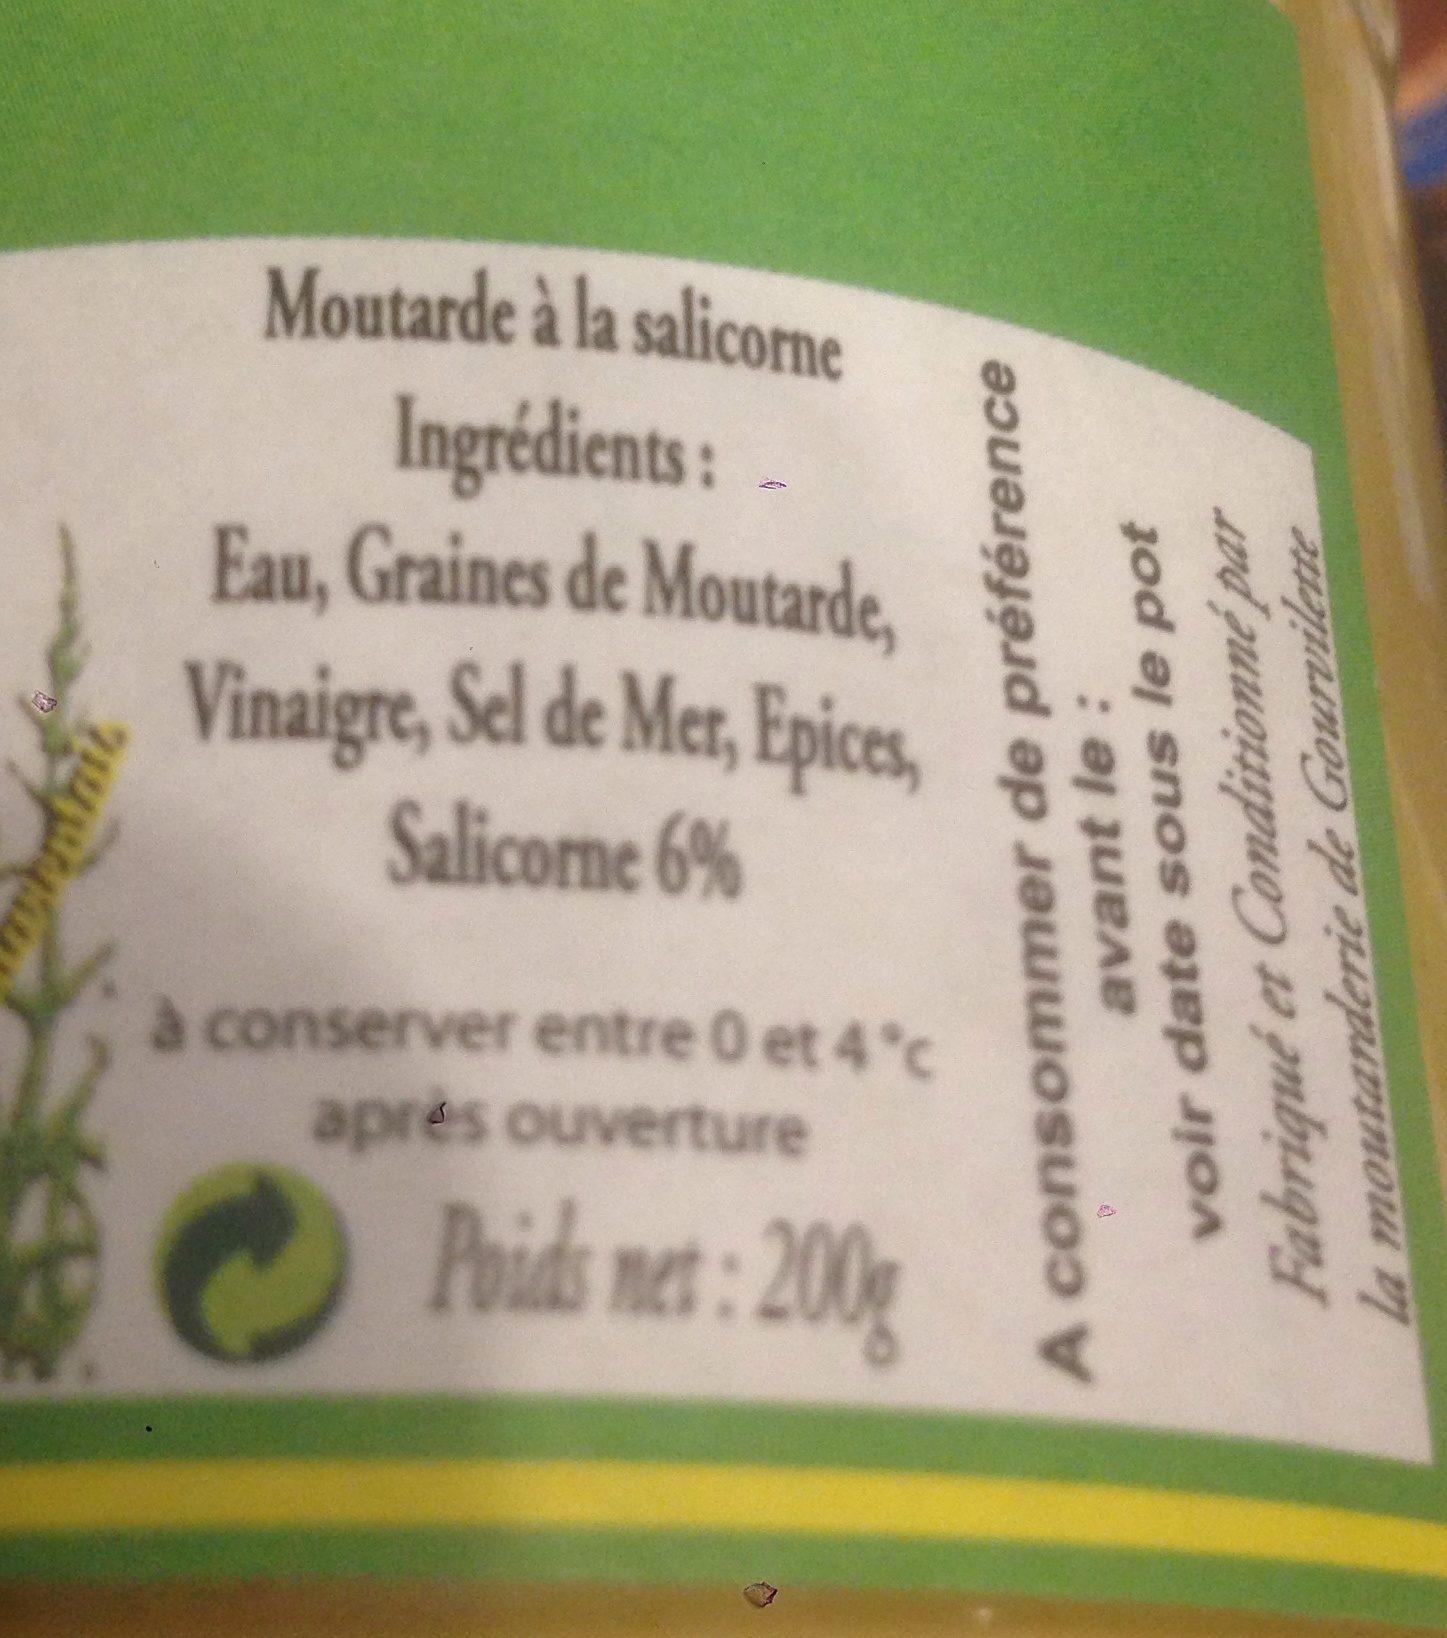 Moutarde a la salicorne - Ingrediënten